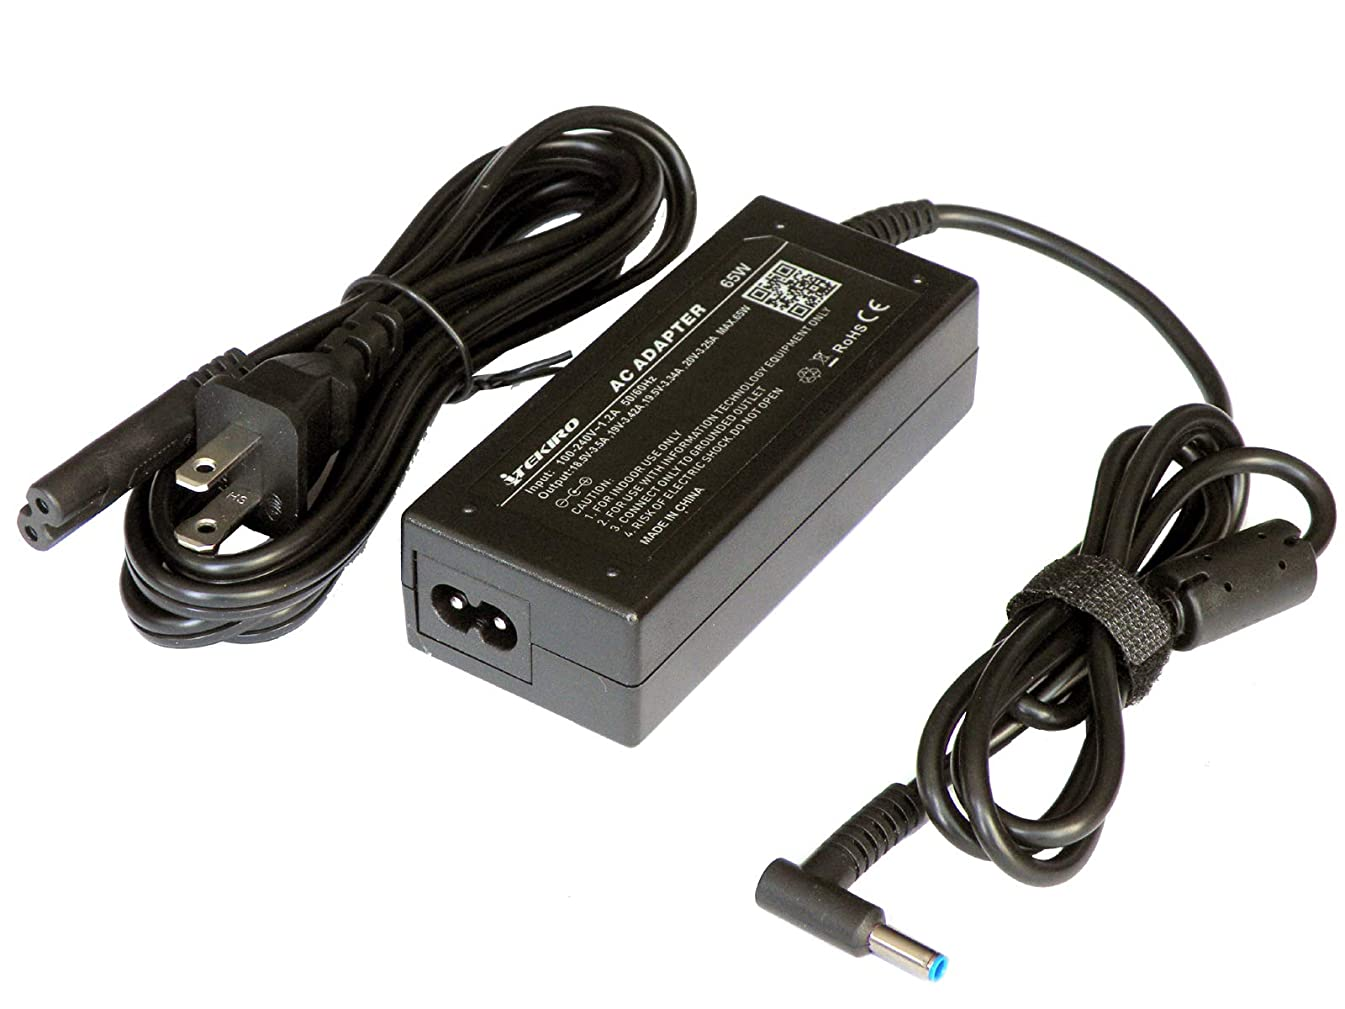 iTEKIRO AC Adapter for HP 15-bk168cl, 15-bk193ms, 15-bp175nr, 15-bn070wm, 15-br075nr, 15-br075nr, 15-br077nr, 15-bs015dx, 15-bs020nr, 15-bs030nr, 15-bs033cl, 15-bs113dx, 15-bw010Nr